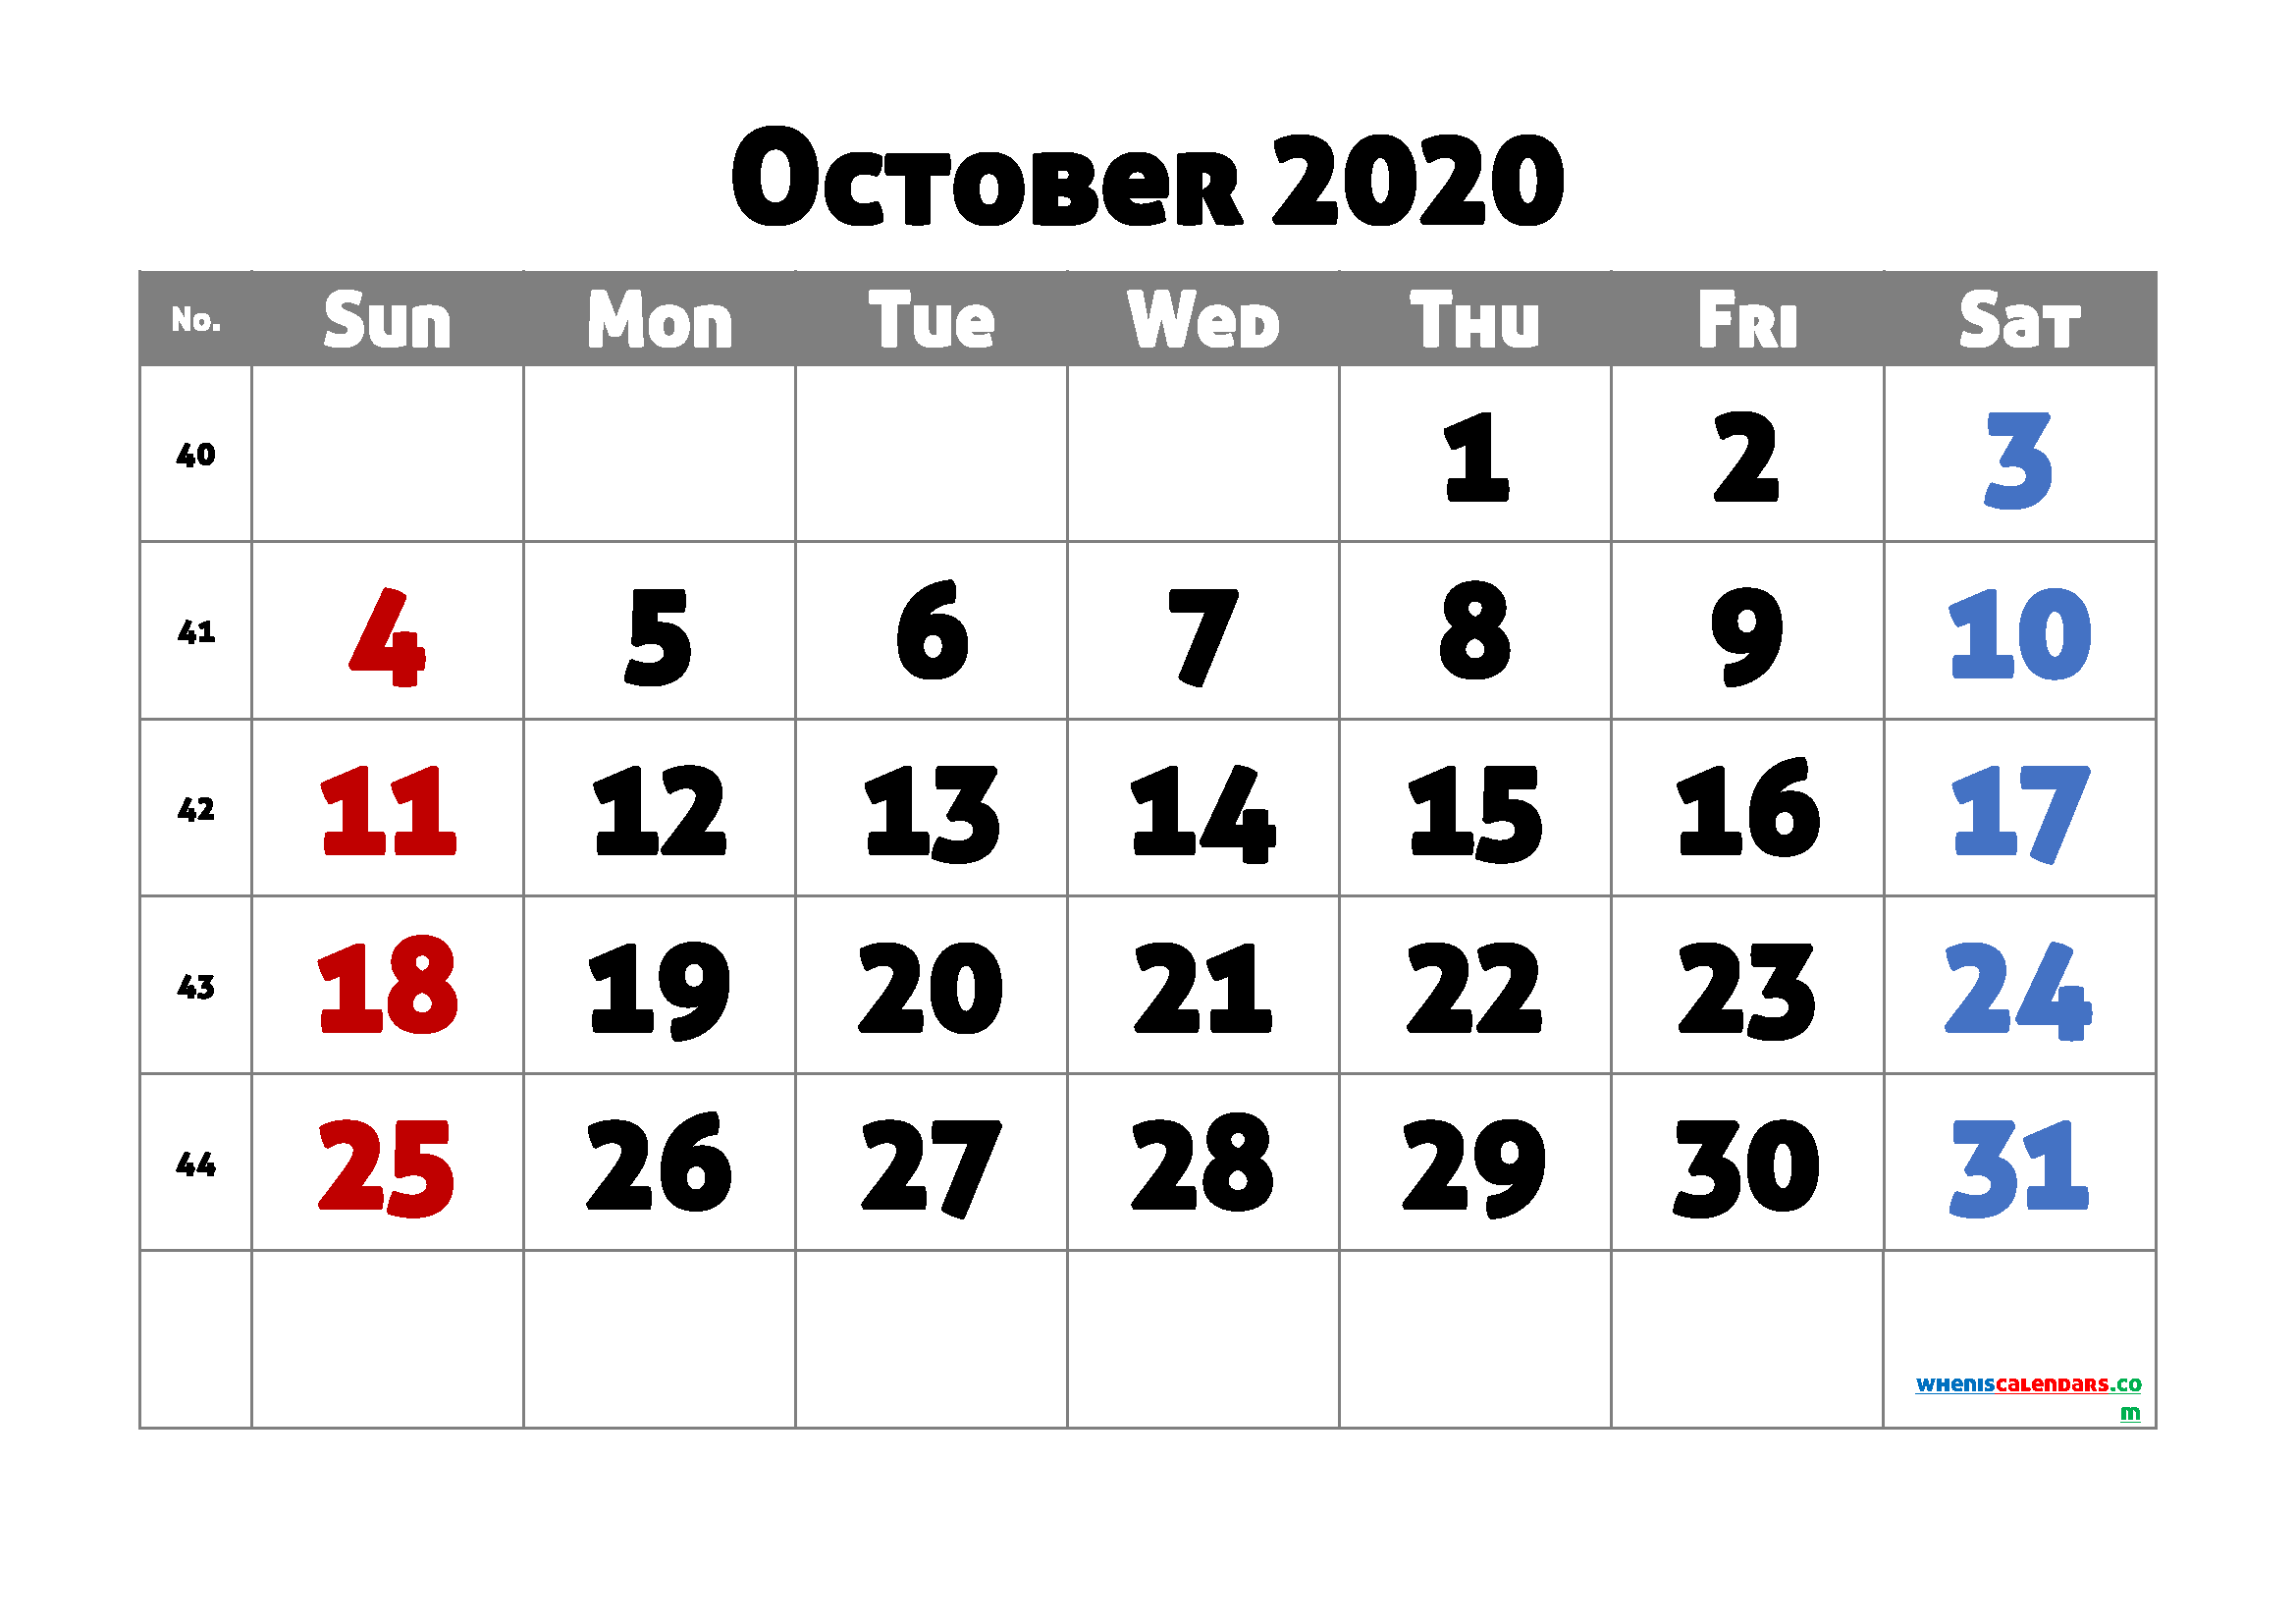 October 2020 Calendar Printable Free